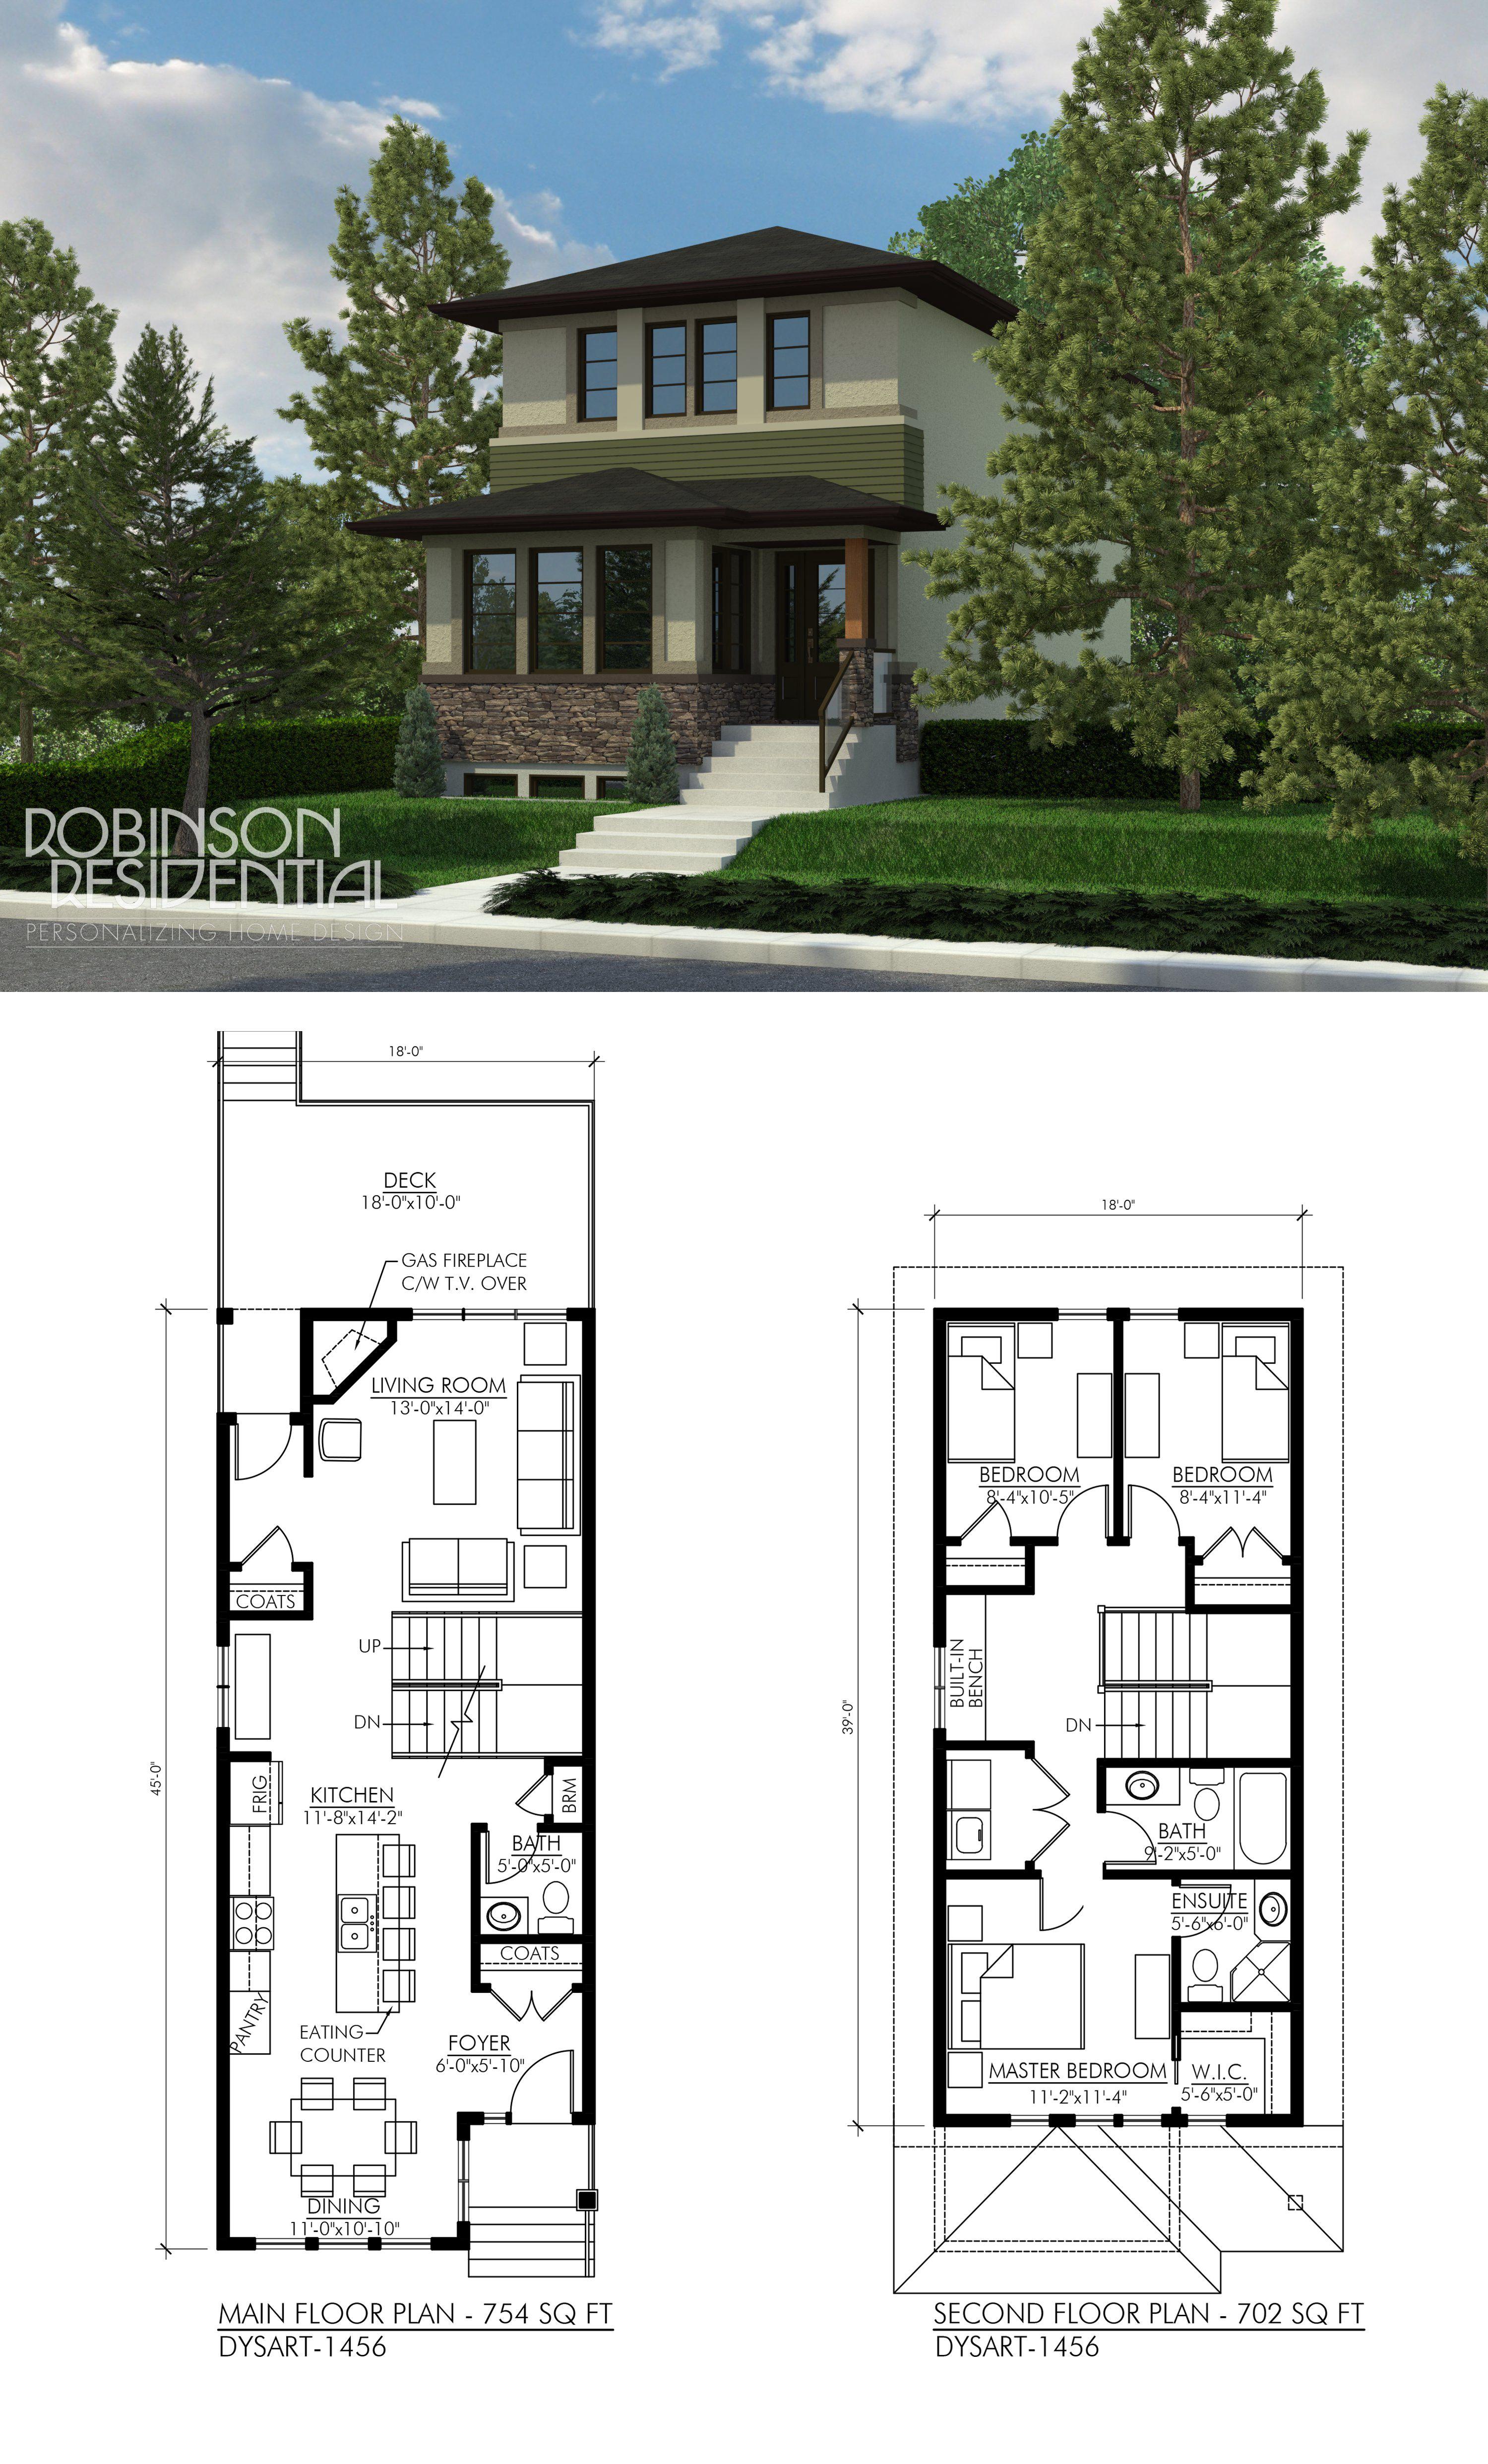 Duplex house plans modern